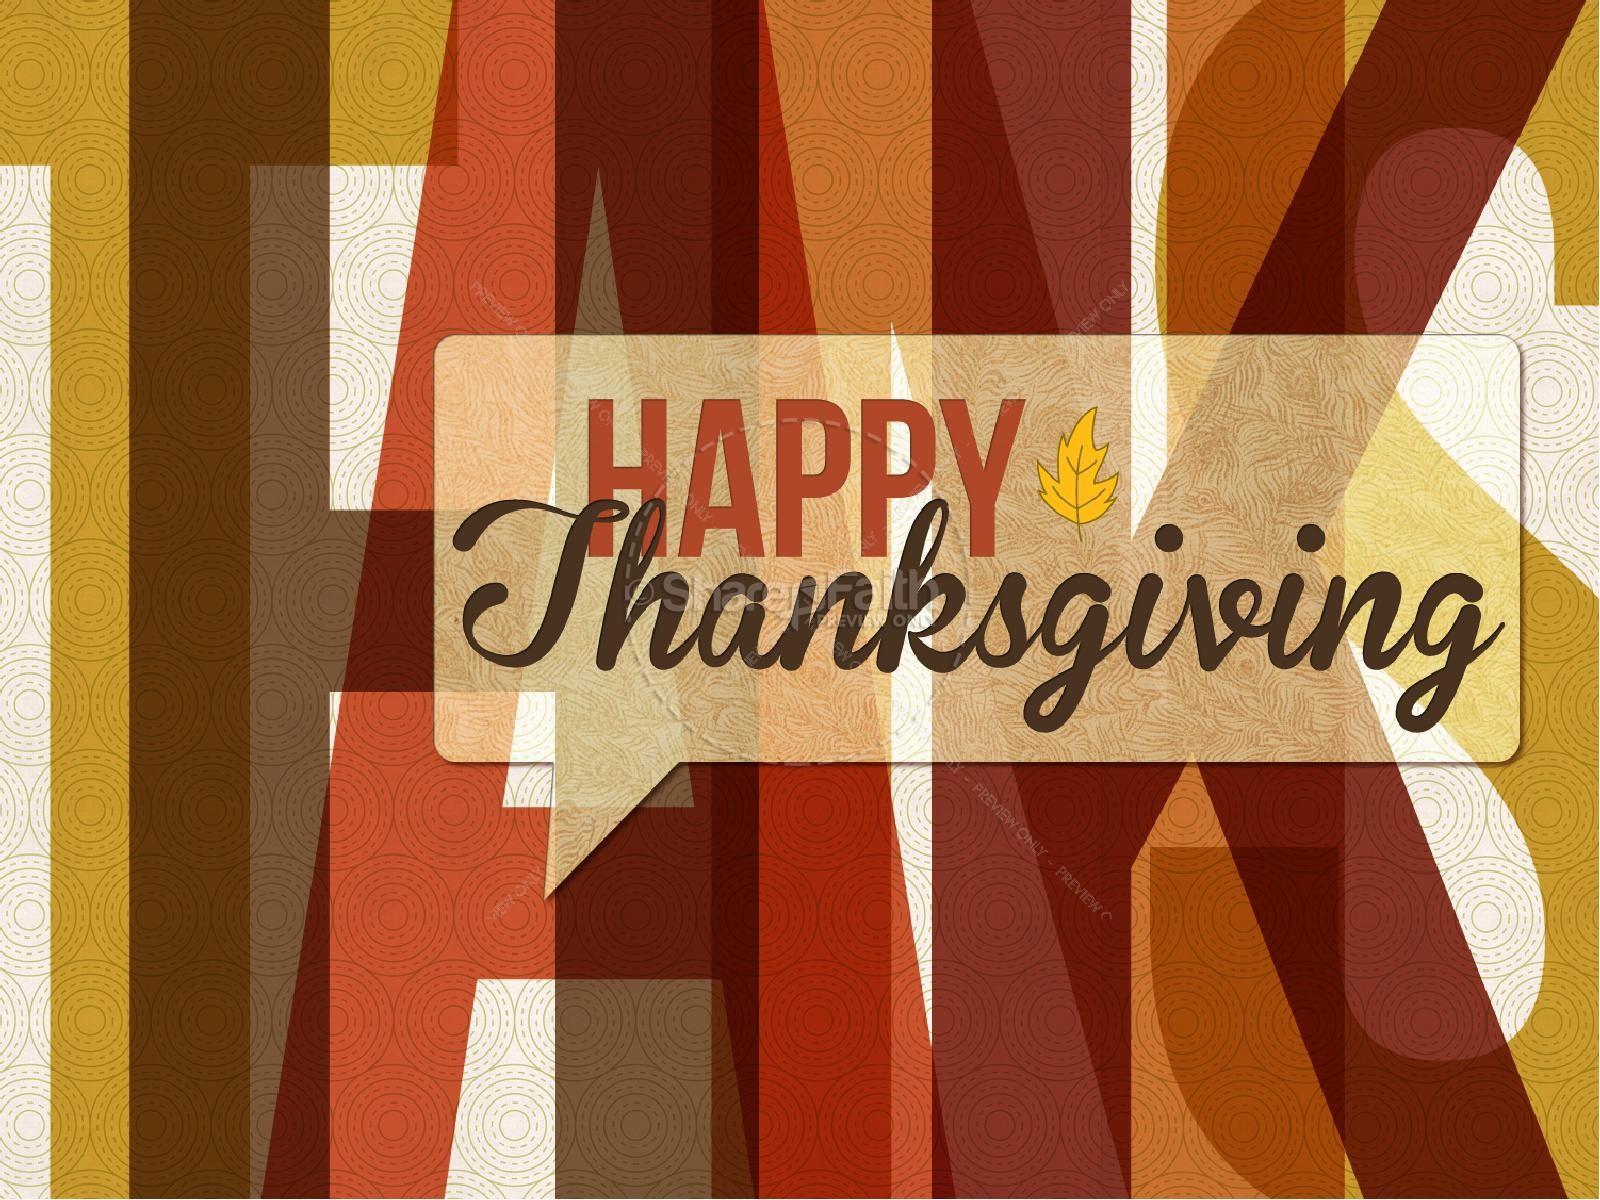 Happy Thanksgiving Art PowerPoint